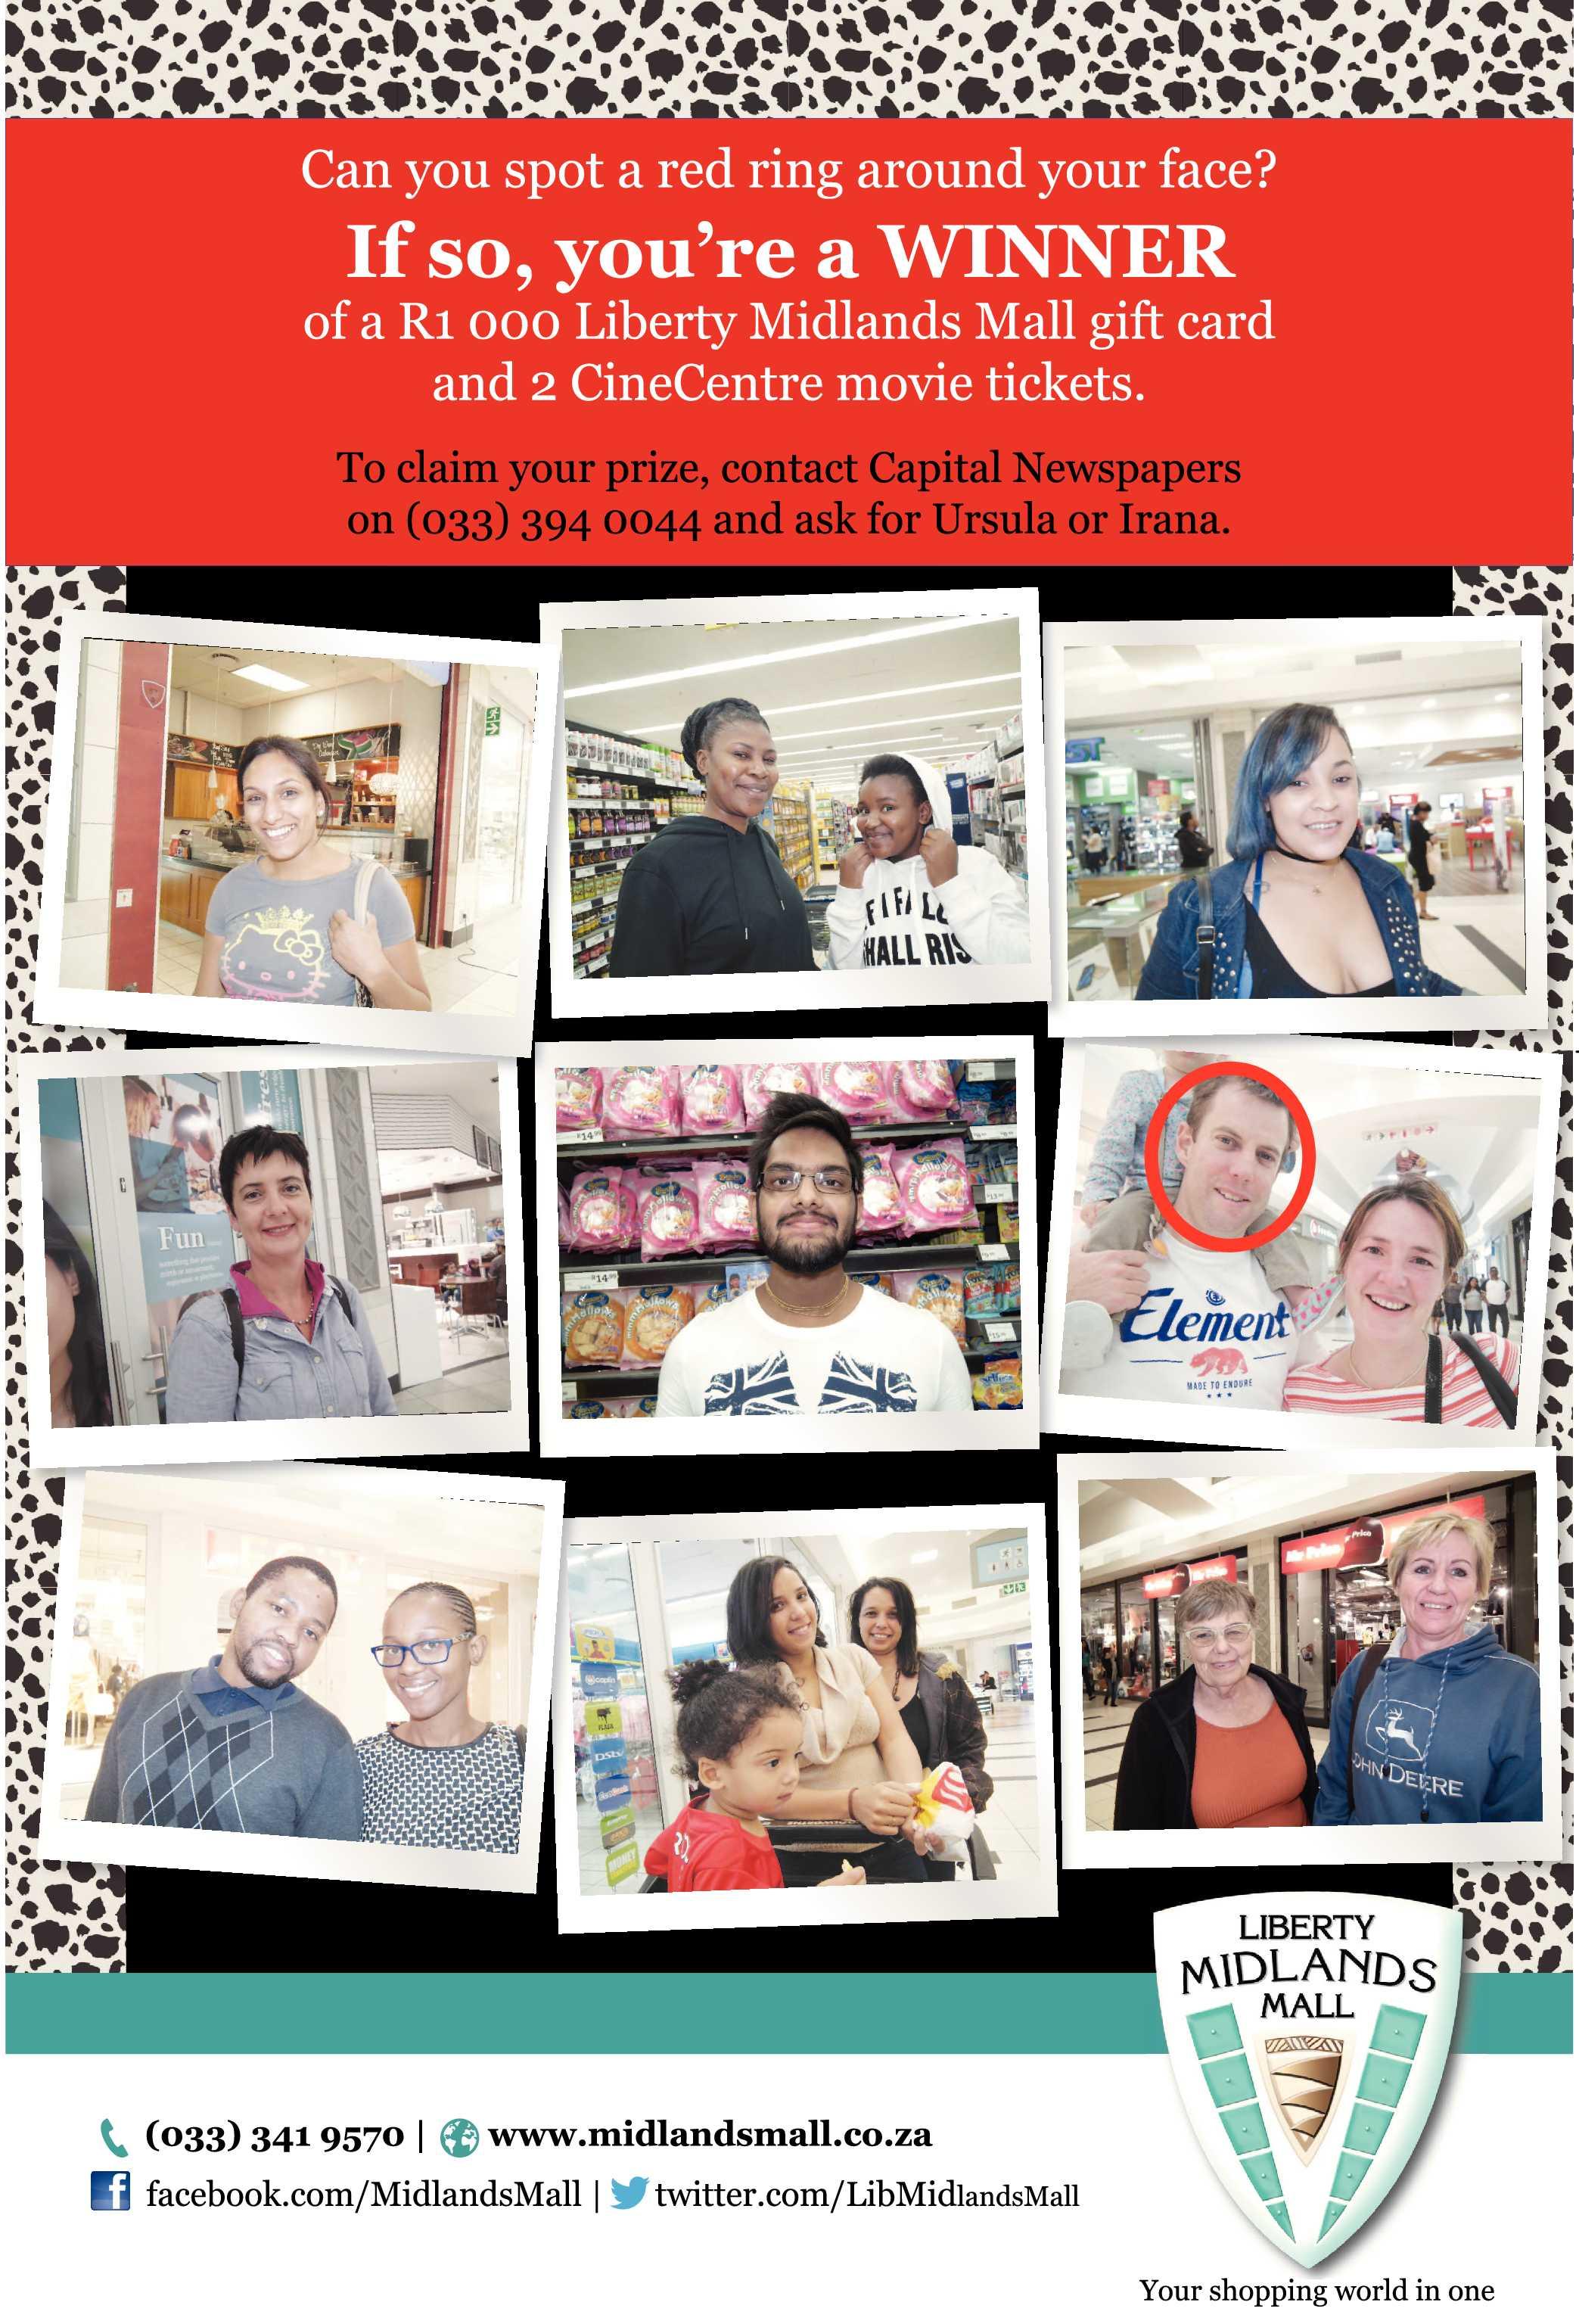 maritzburgsun-21-04-2017-epapers-page-14